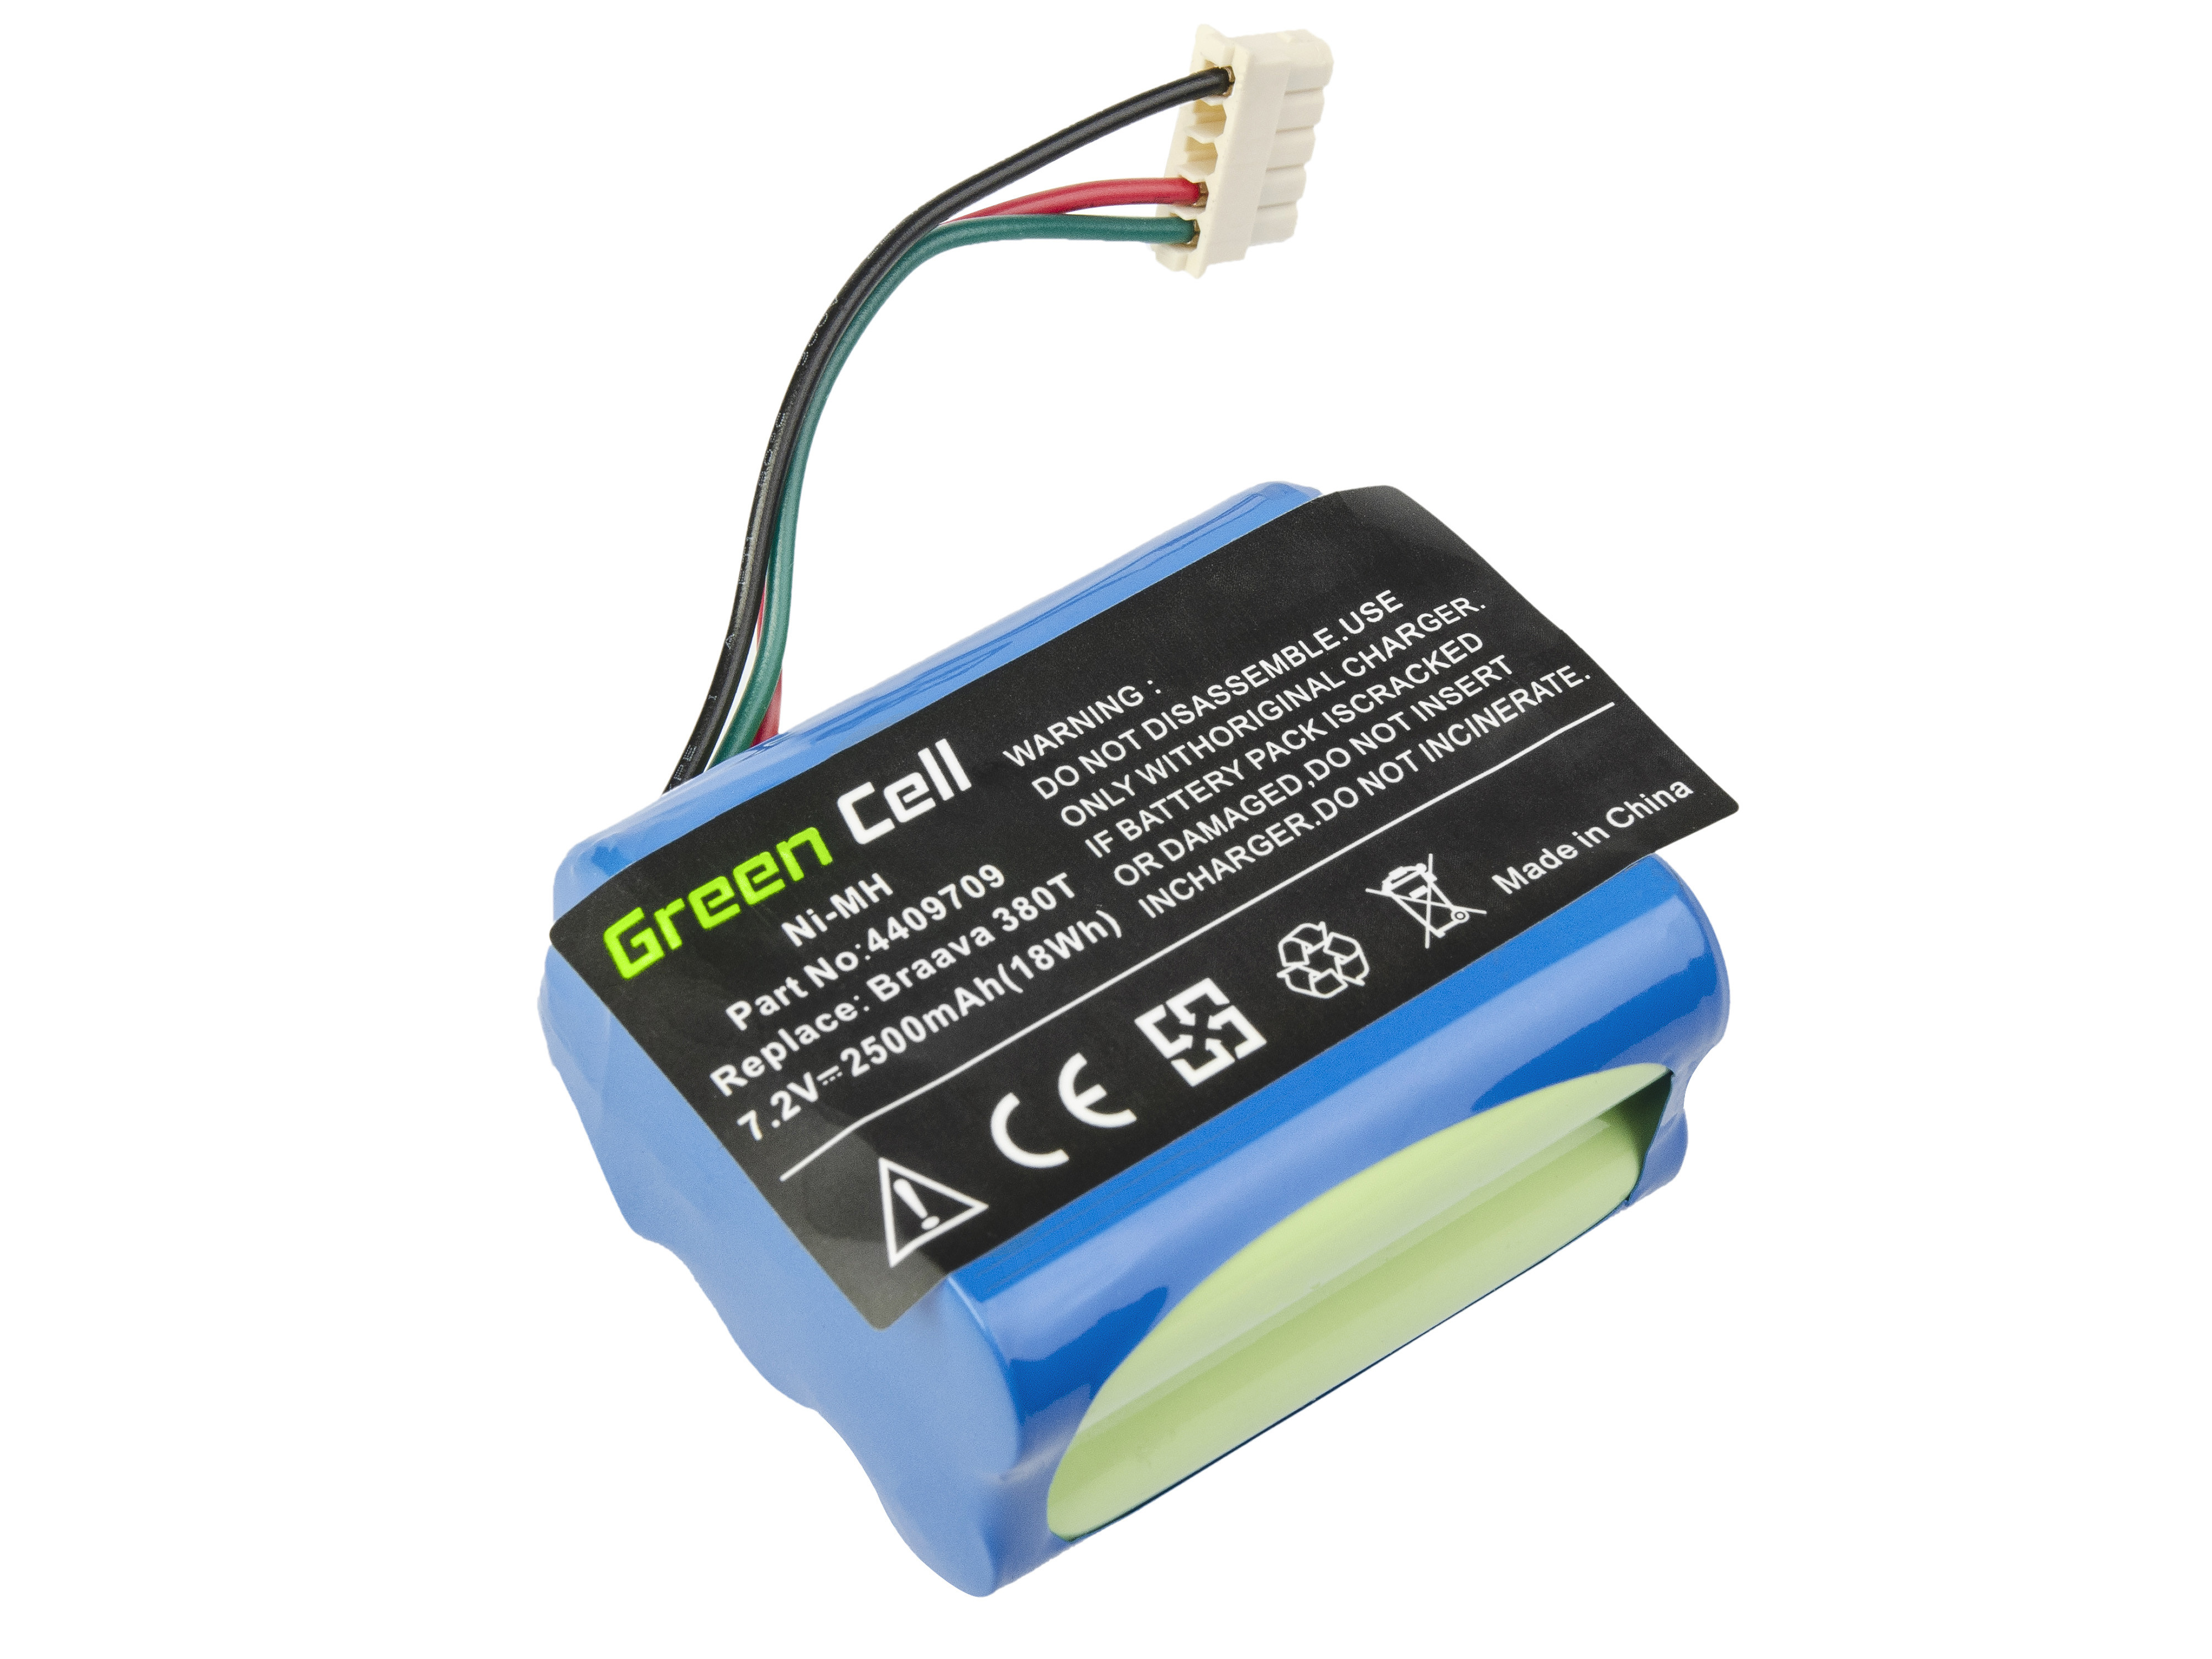 Green Cell Power Tool Battery iRobot Braava / Mint 380 380T 5200 5200B 5200C Plus 7.2V 2.5Ah